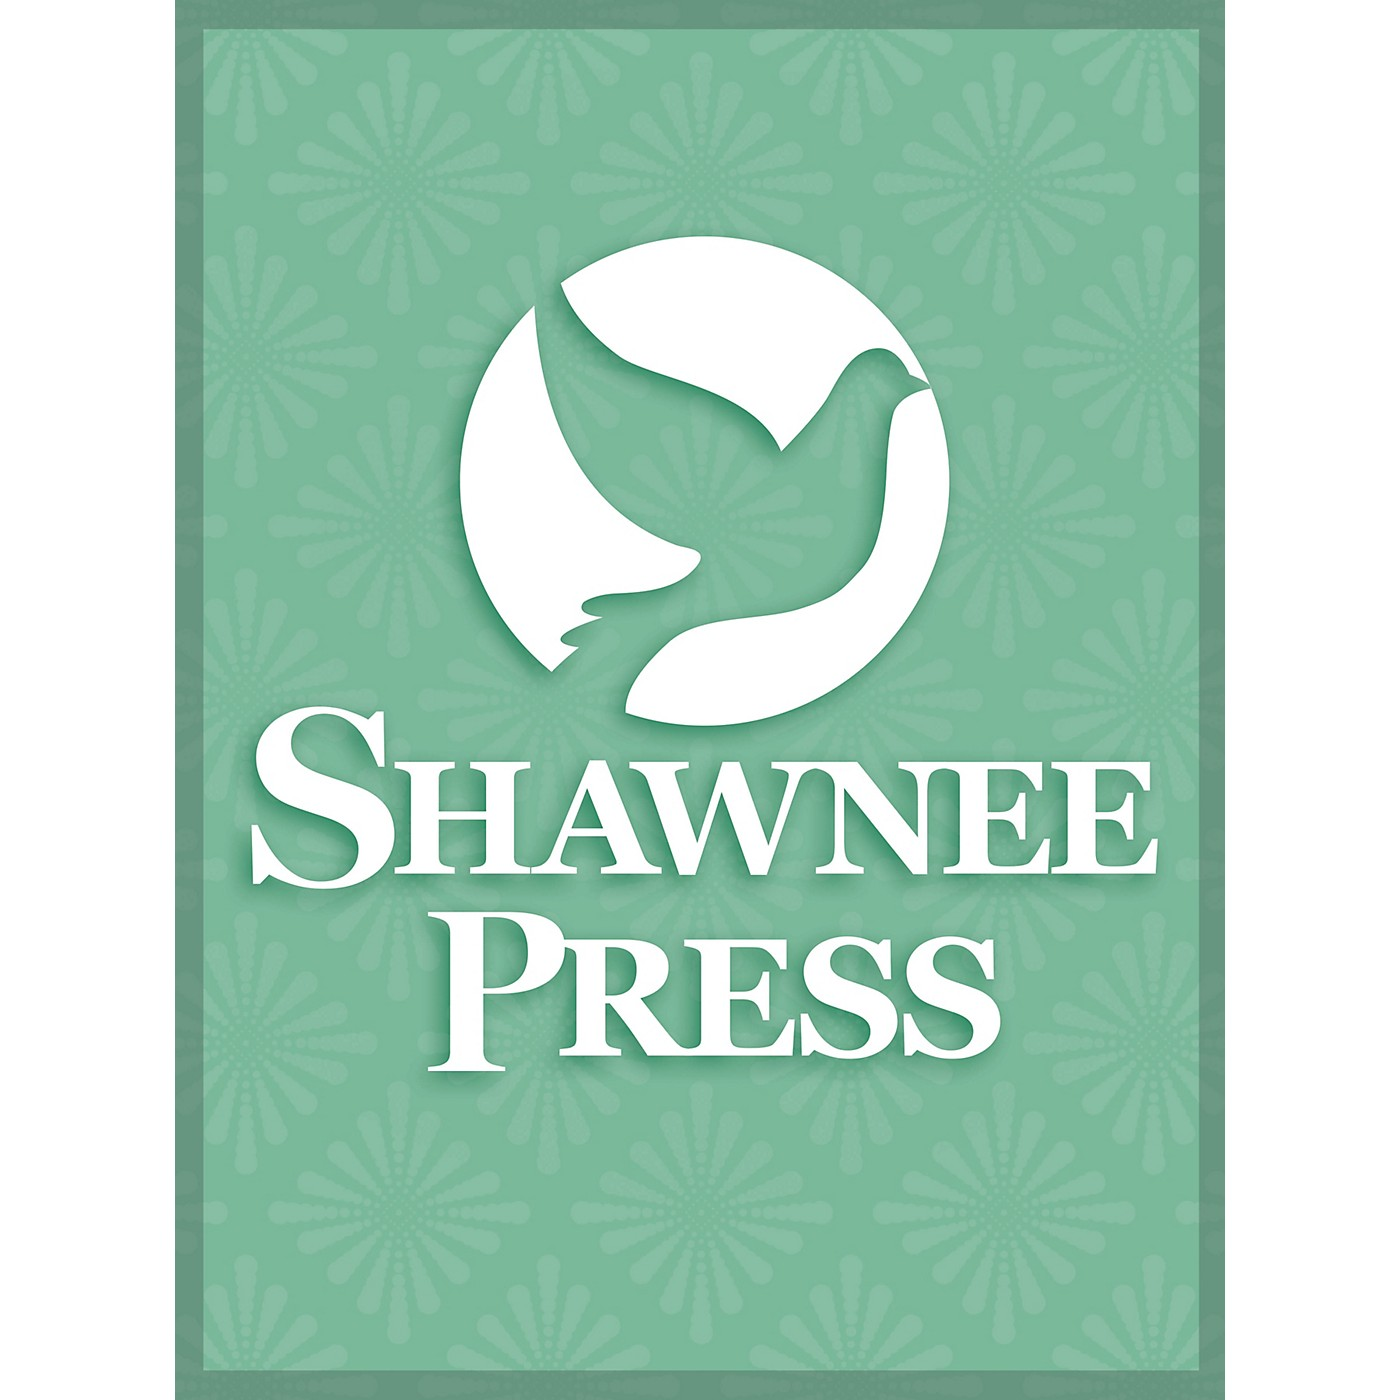 Shawnee Press Jesu, Joy of Man's Desiring (3-4 Octaves of Handbells) Arranged by R. Ivey thumbnail